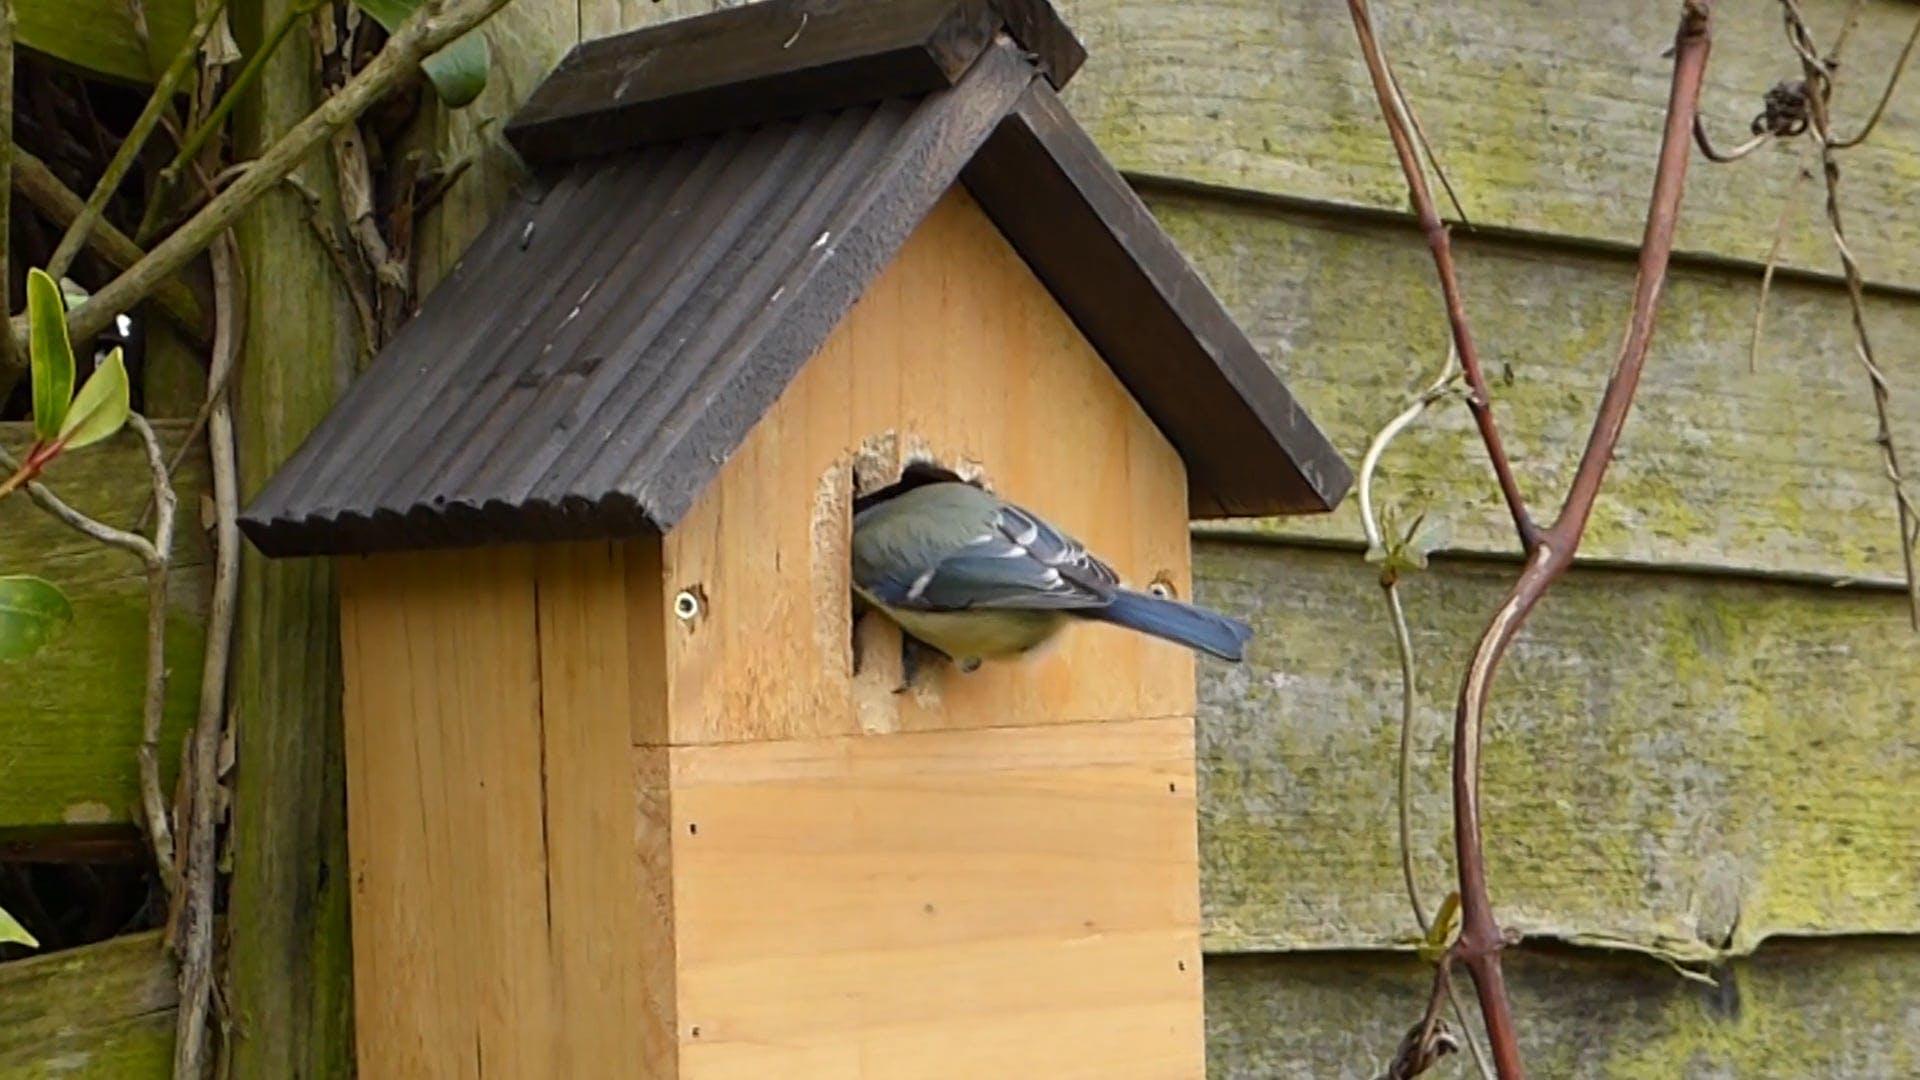 Bird Pecking Creating A Hole